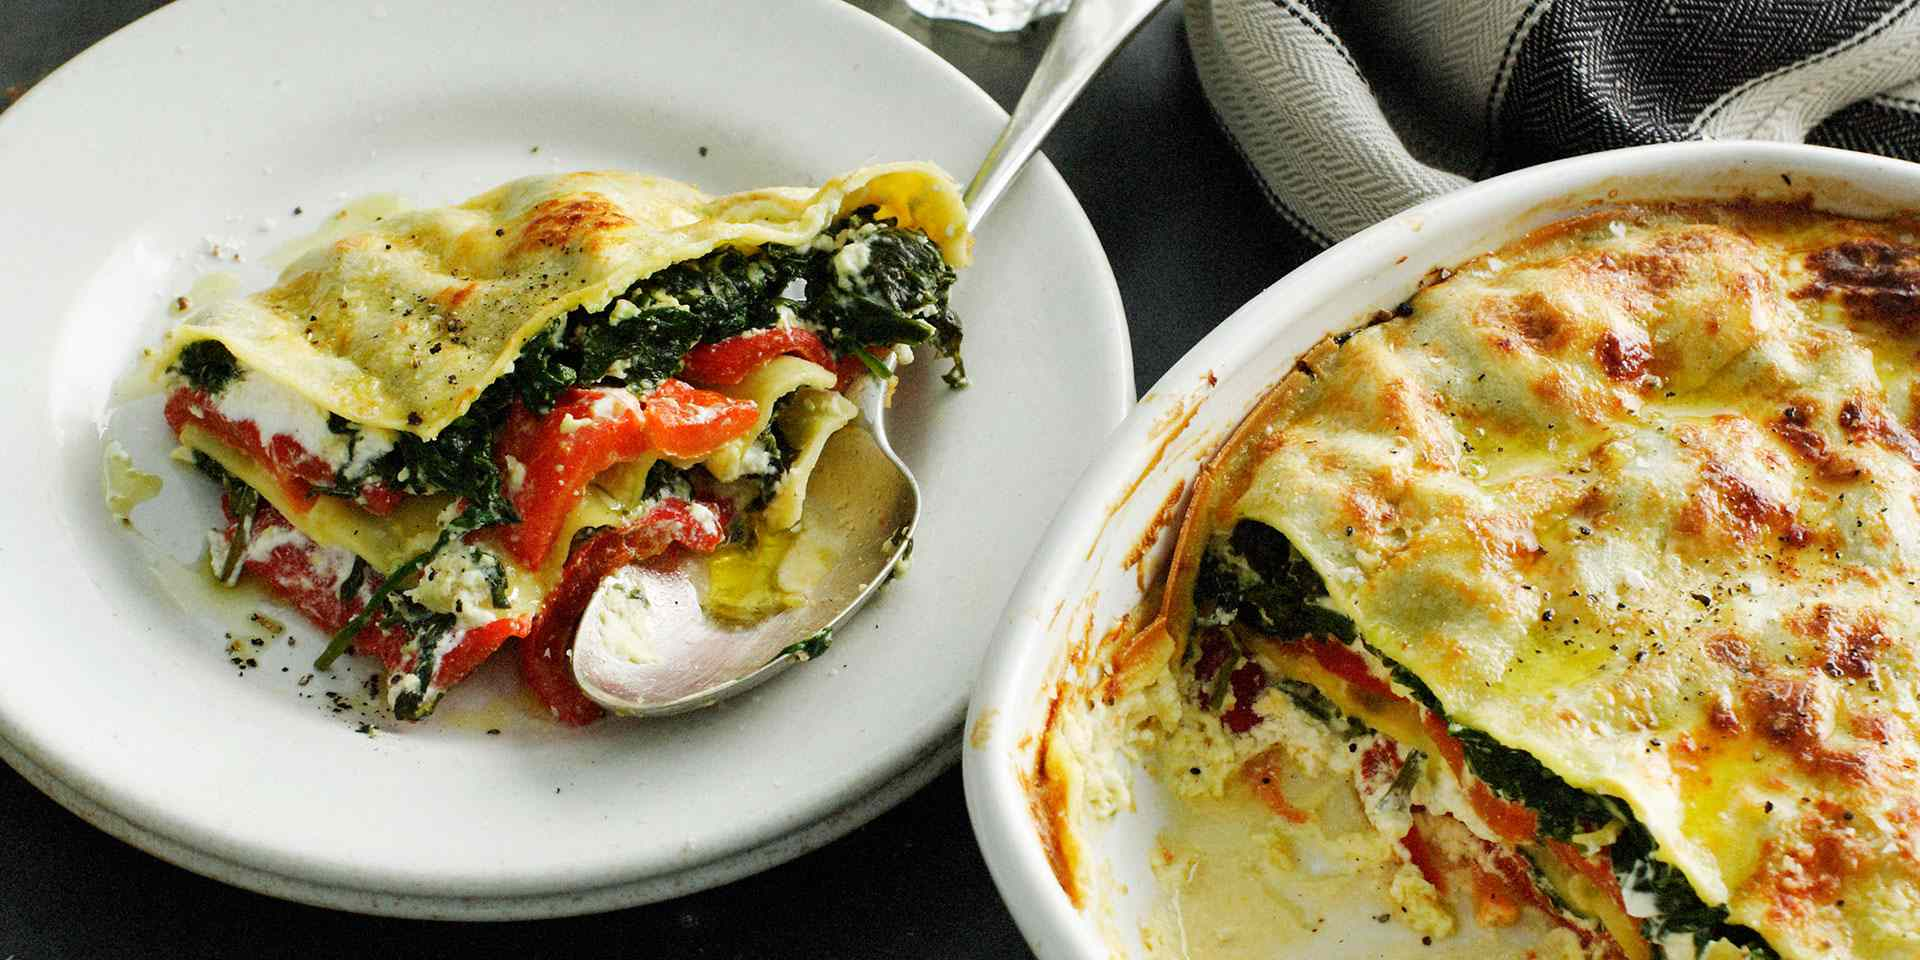 White lasagna full of veggies